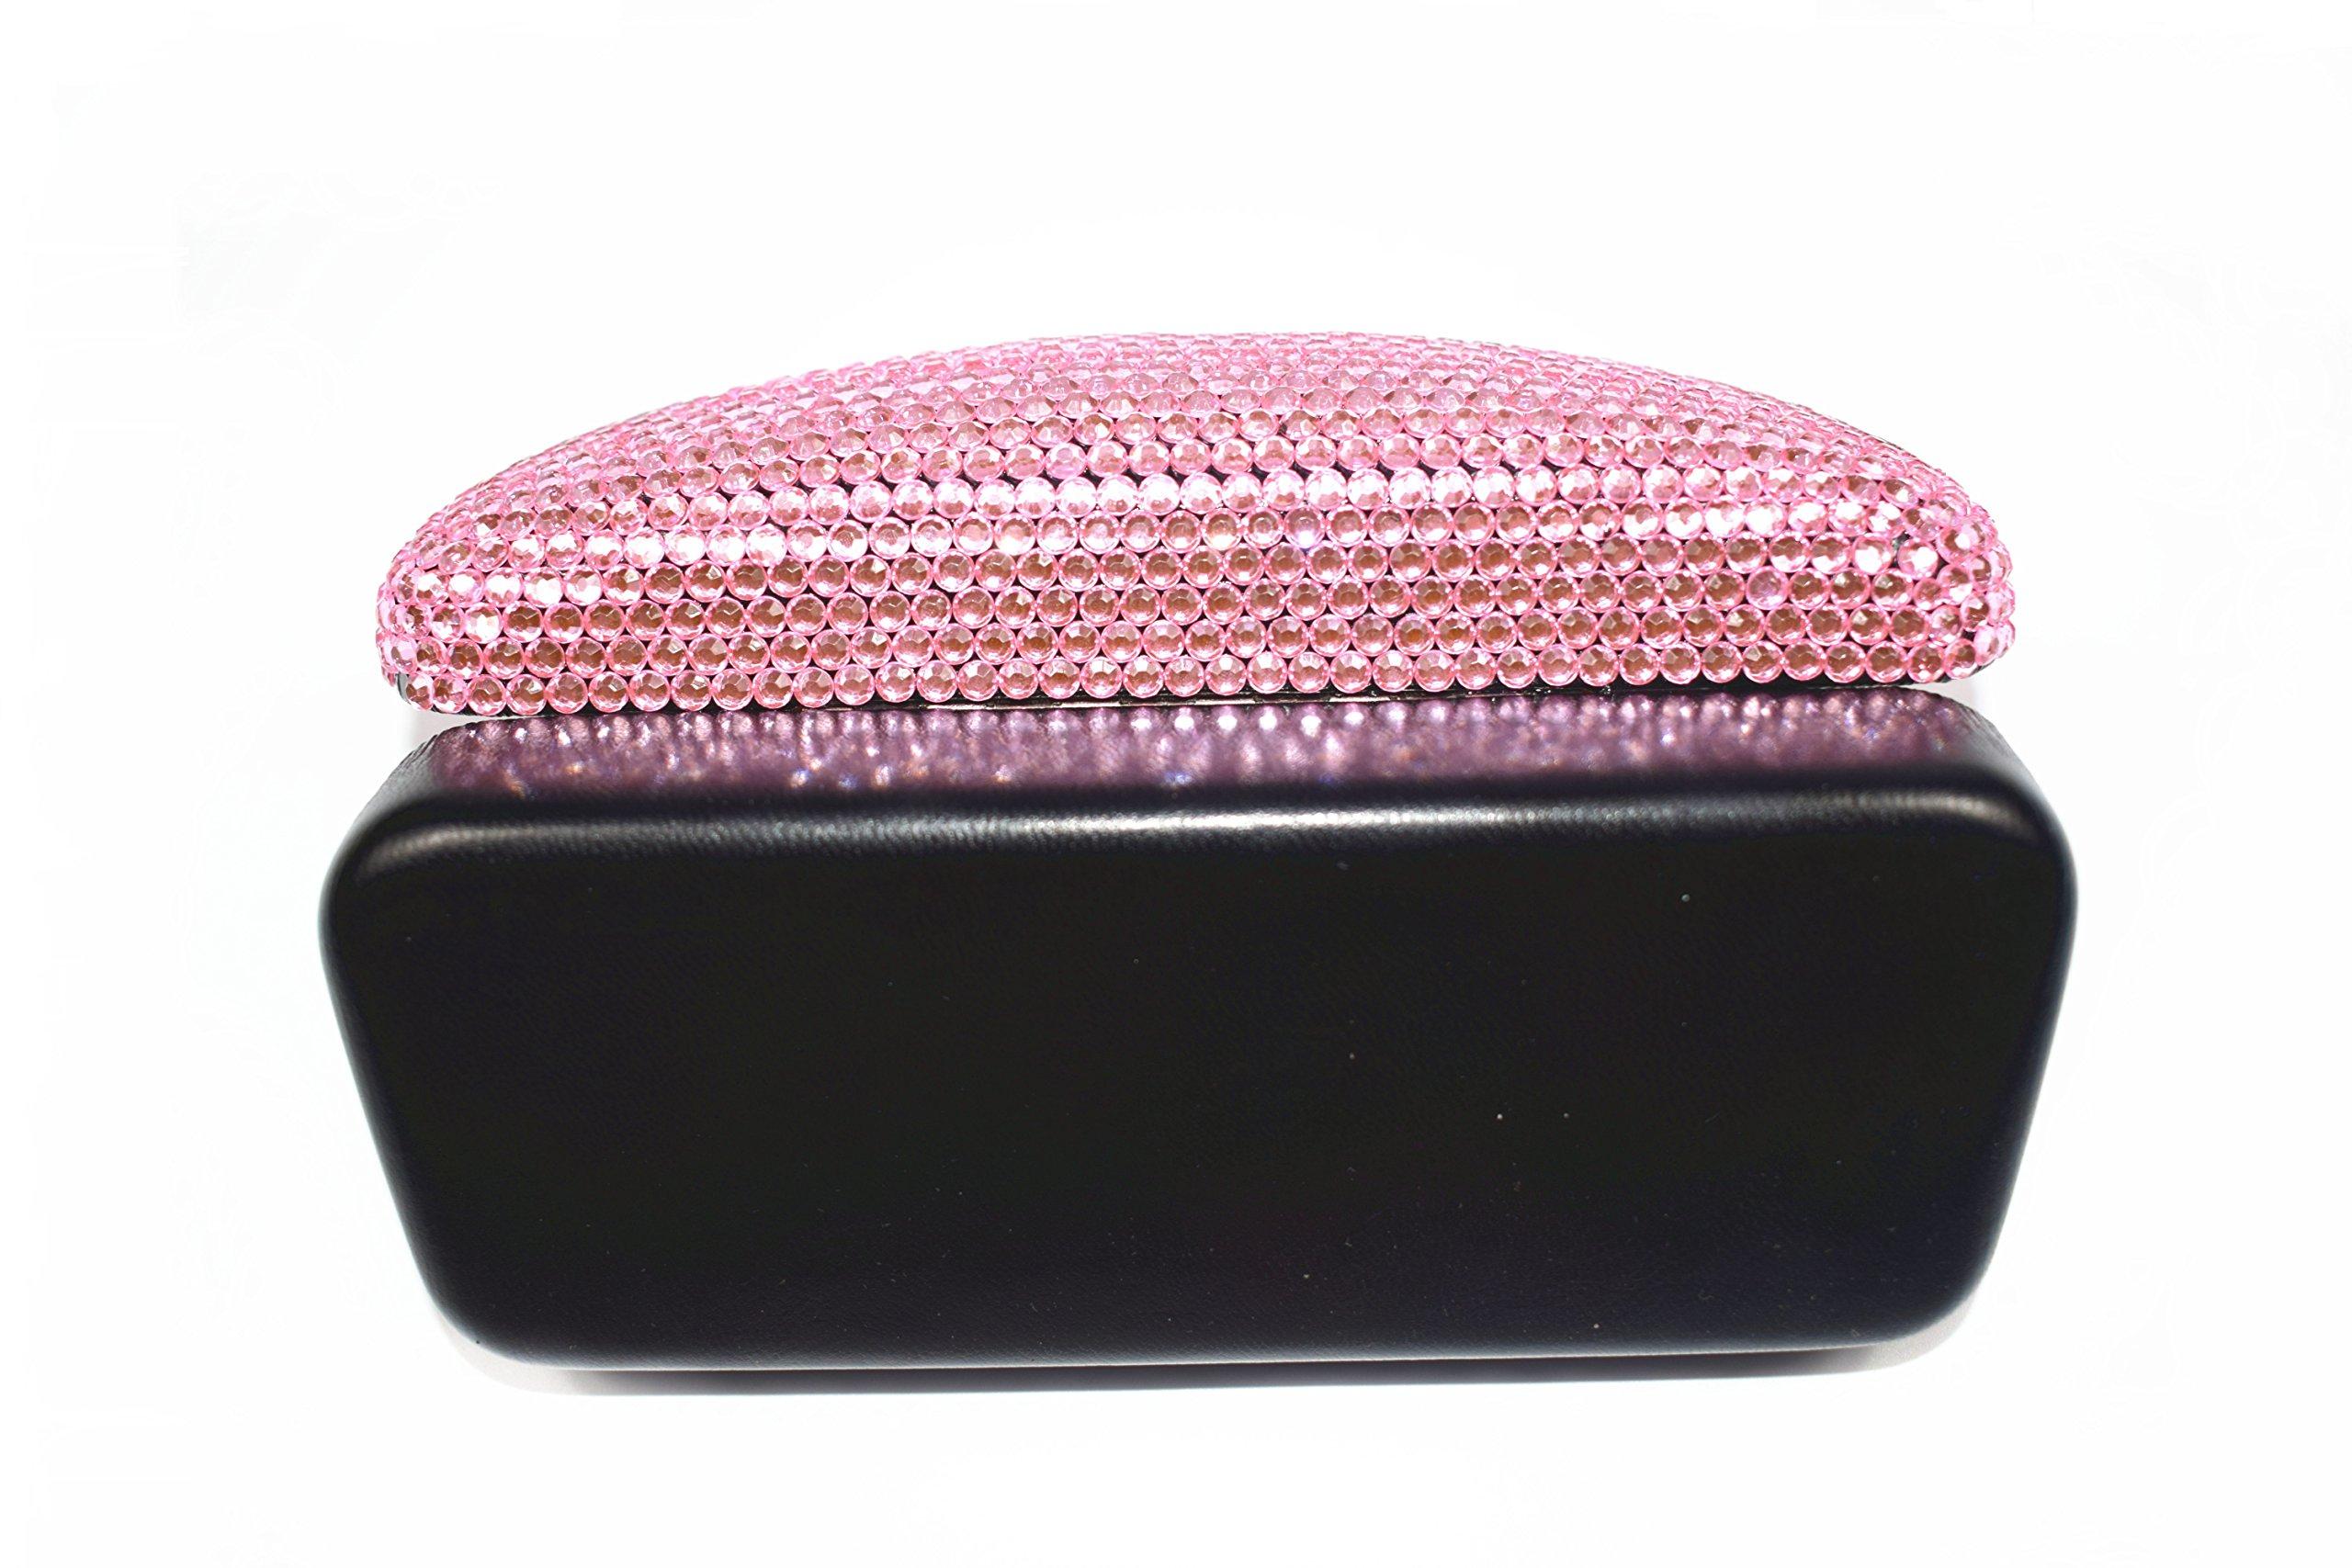 Fashion Pink Bling Crystal Travel Glasses Case Cute Rhinestone Gift Eyeglasses Box by Bling Dynasty (Image #6)